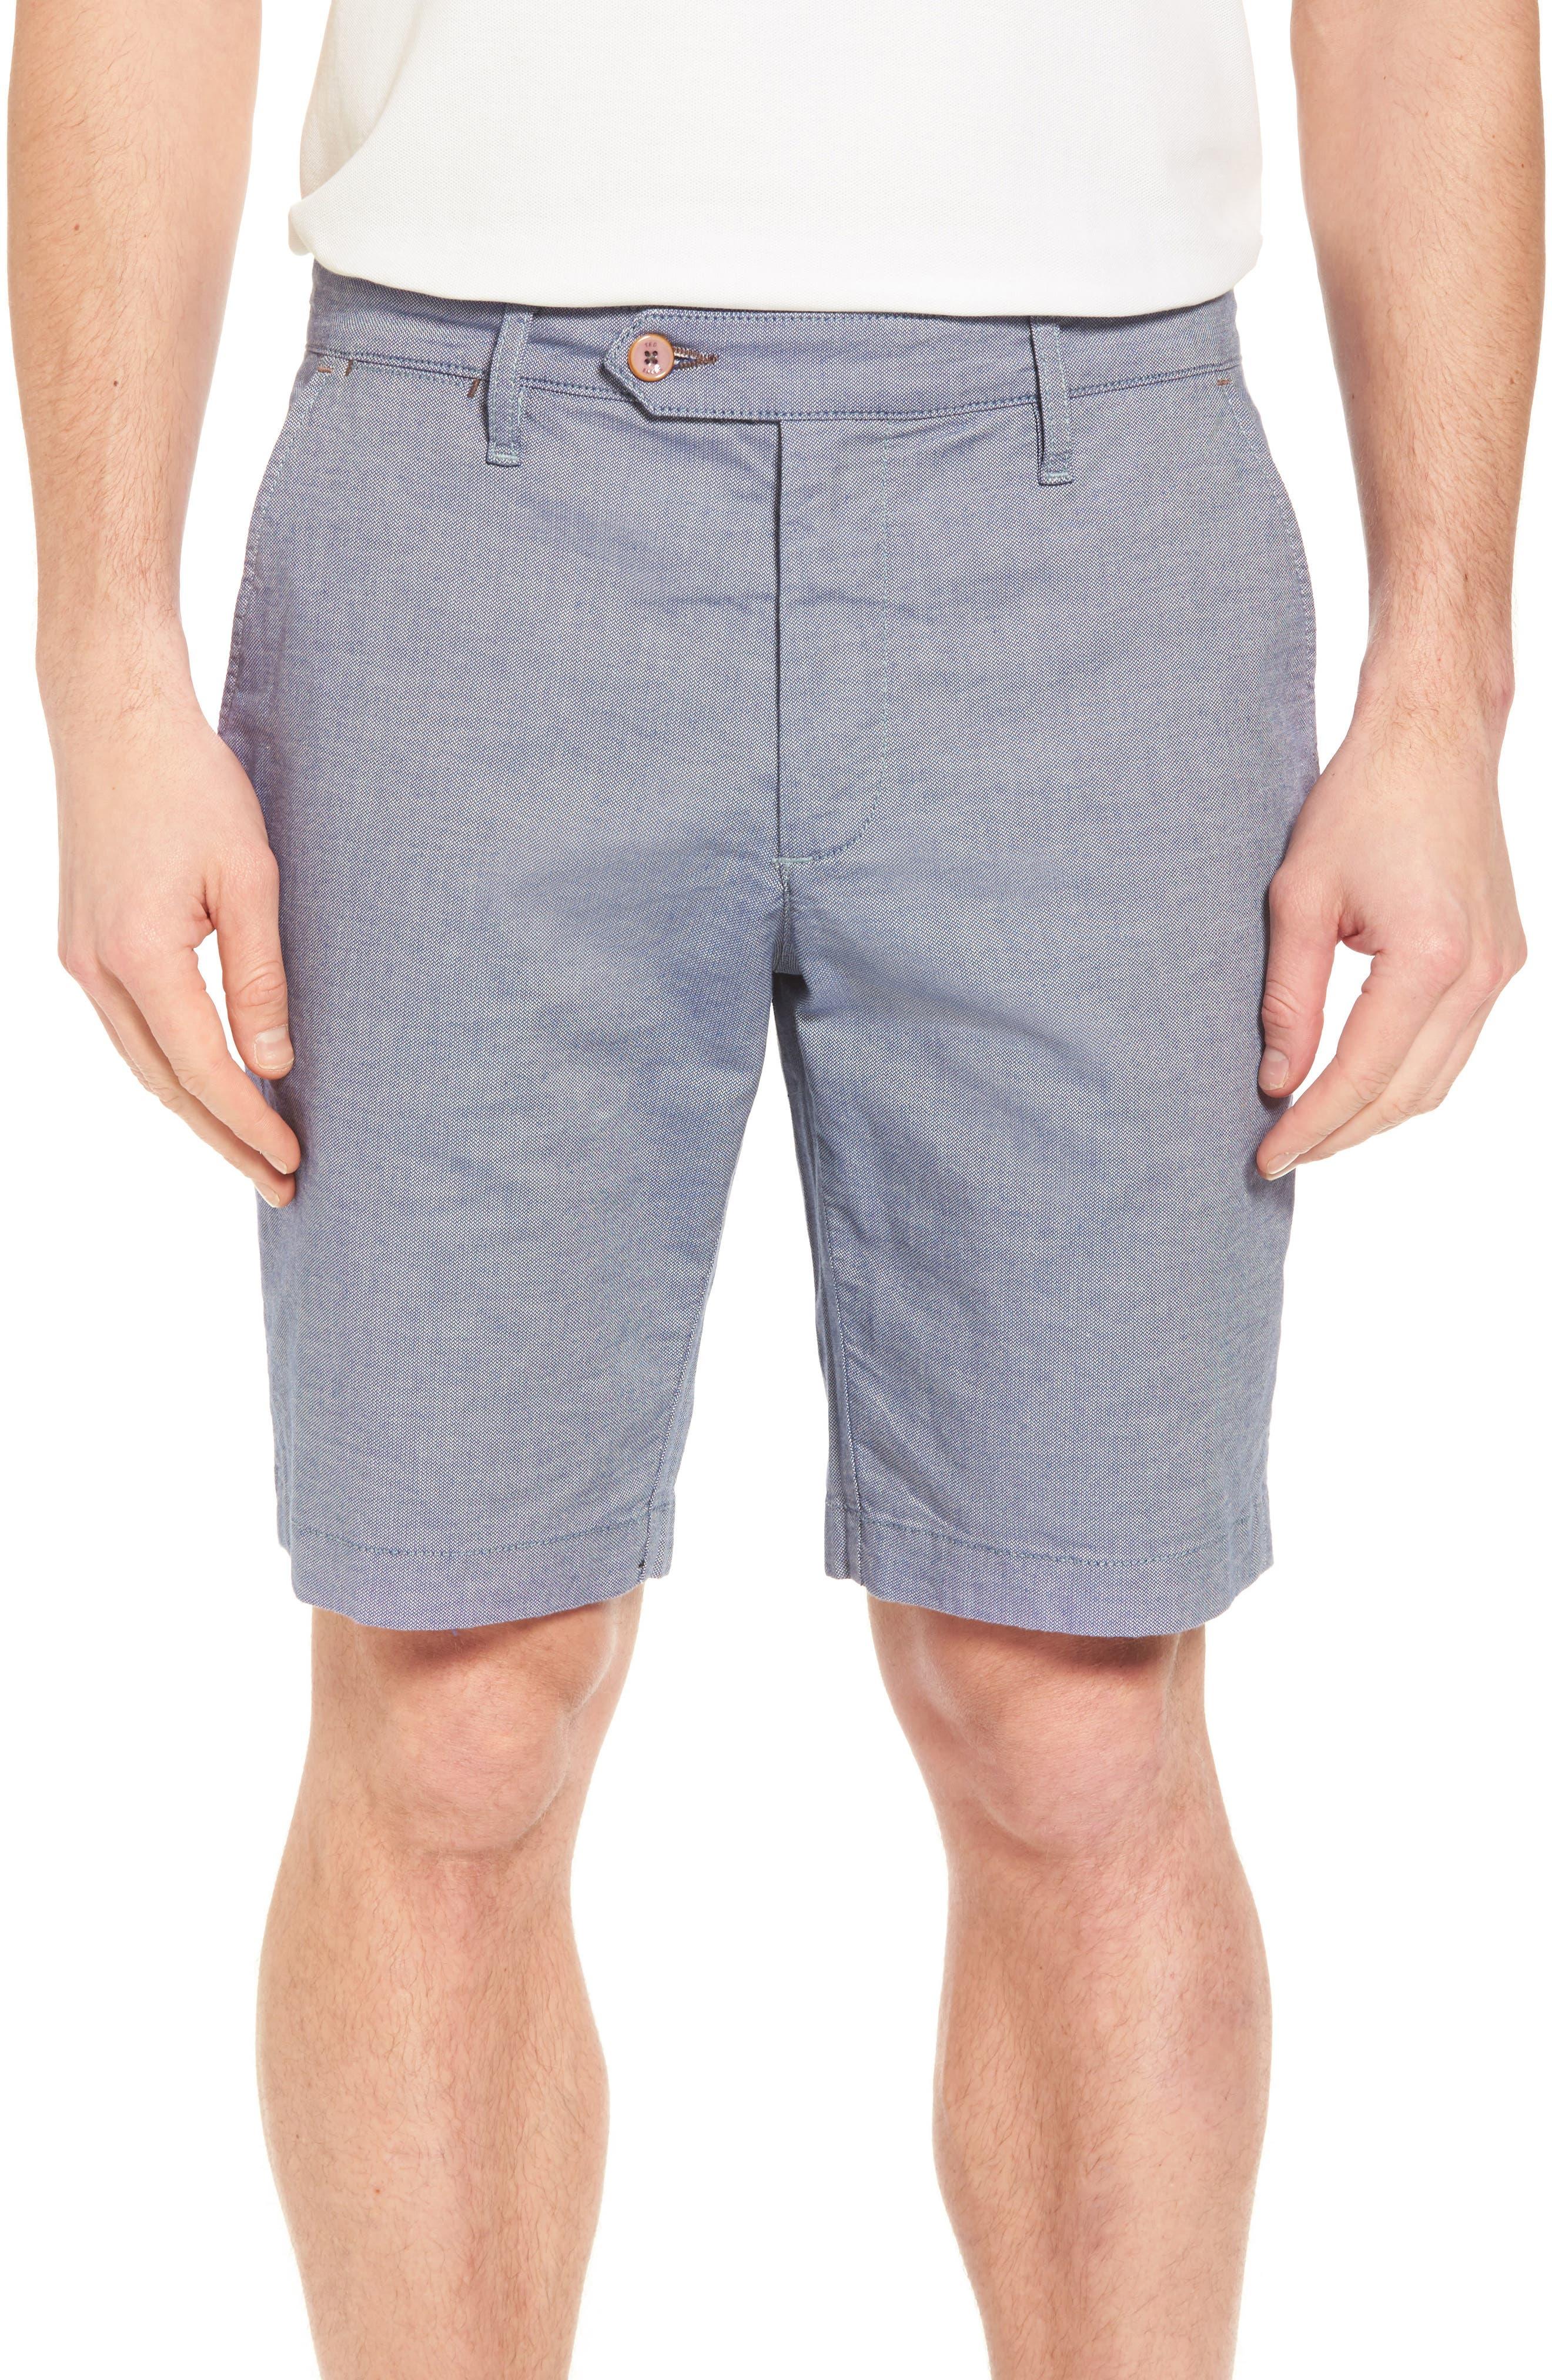 Herbosh Shorts,                         Main,                         color, Navy